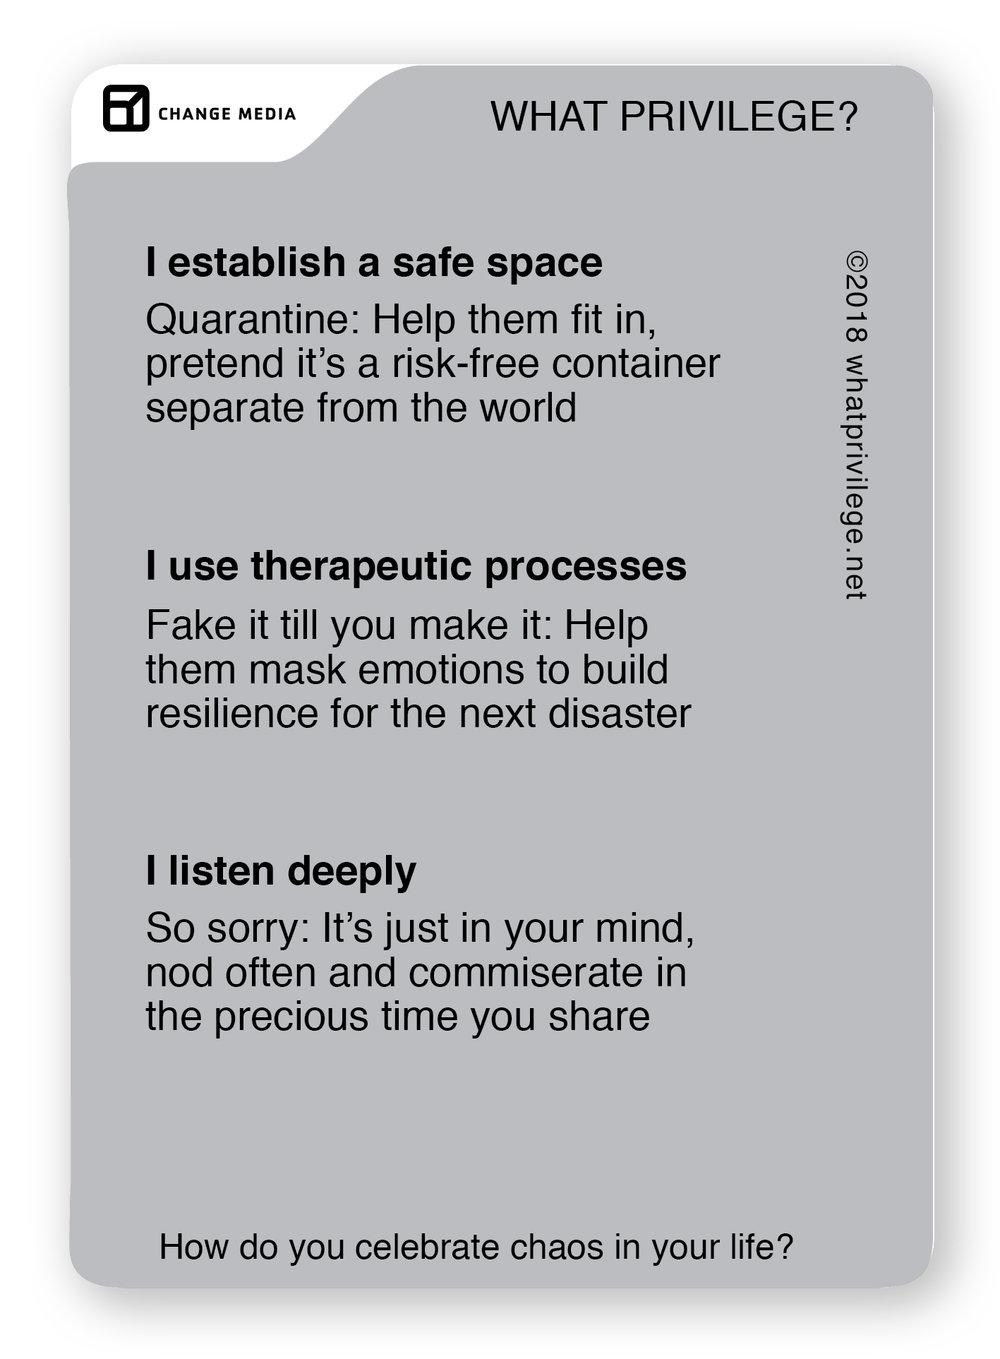 whatprivilege-emotions8-back.jpg